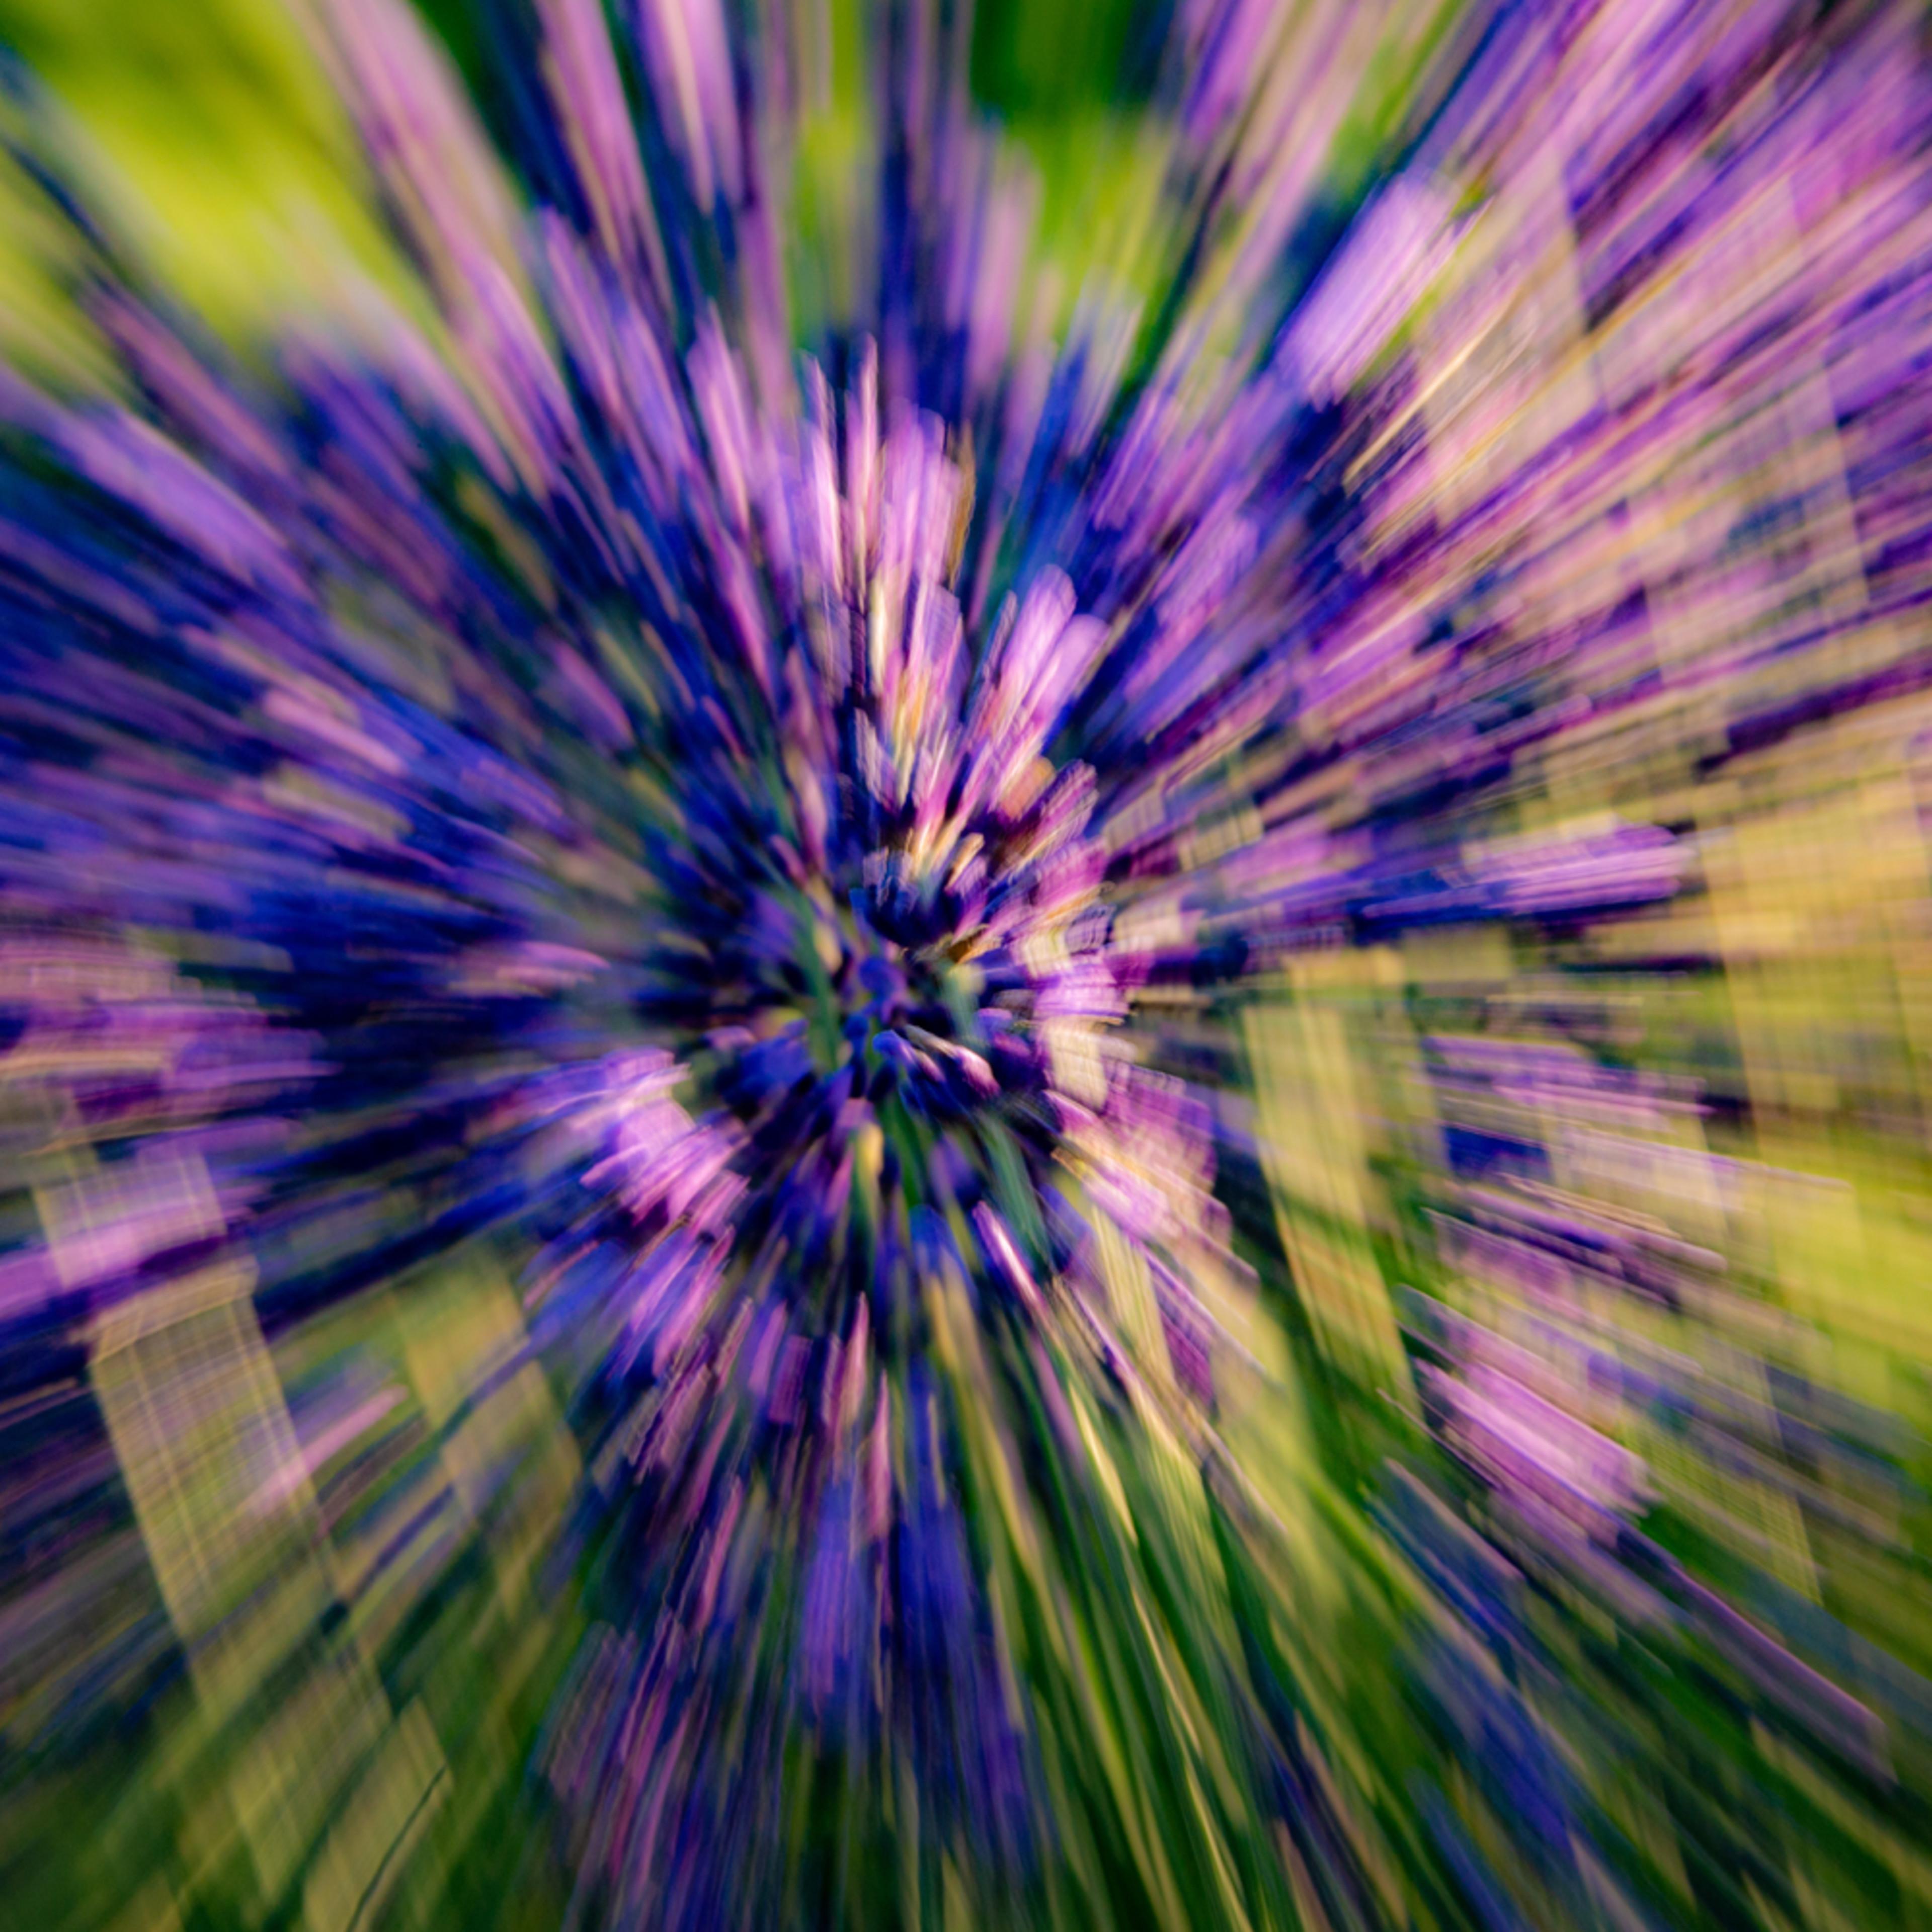 Bursting with lavender pnco8o